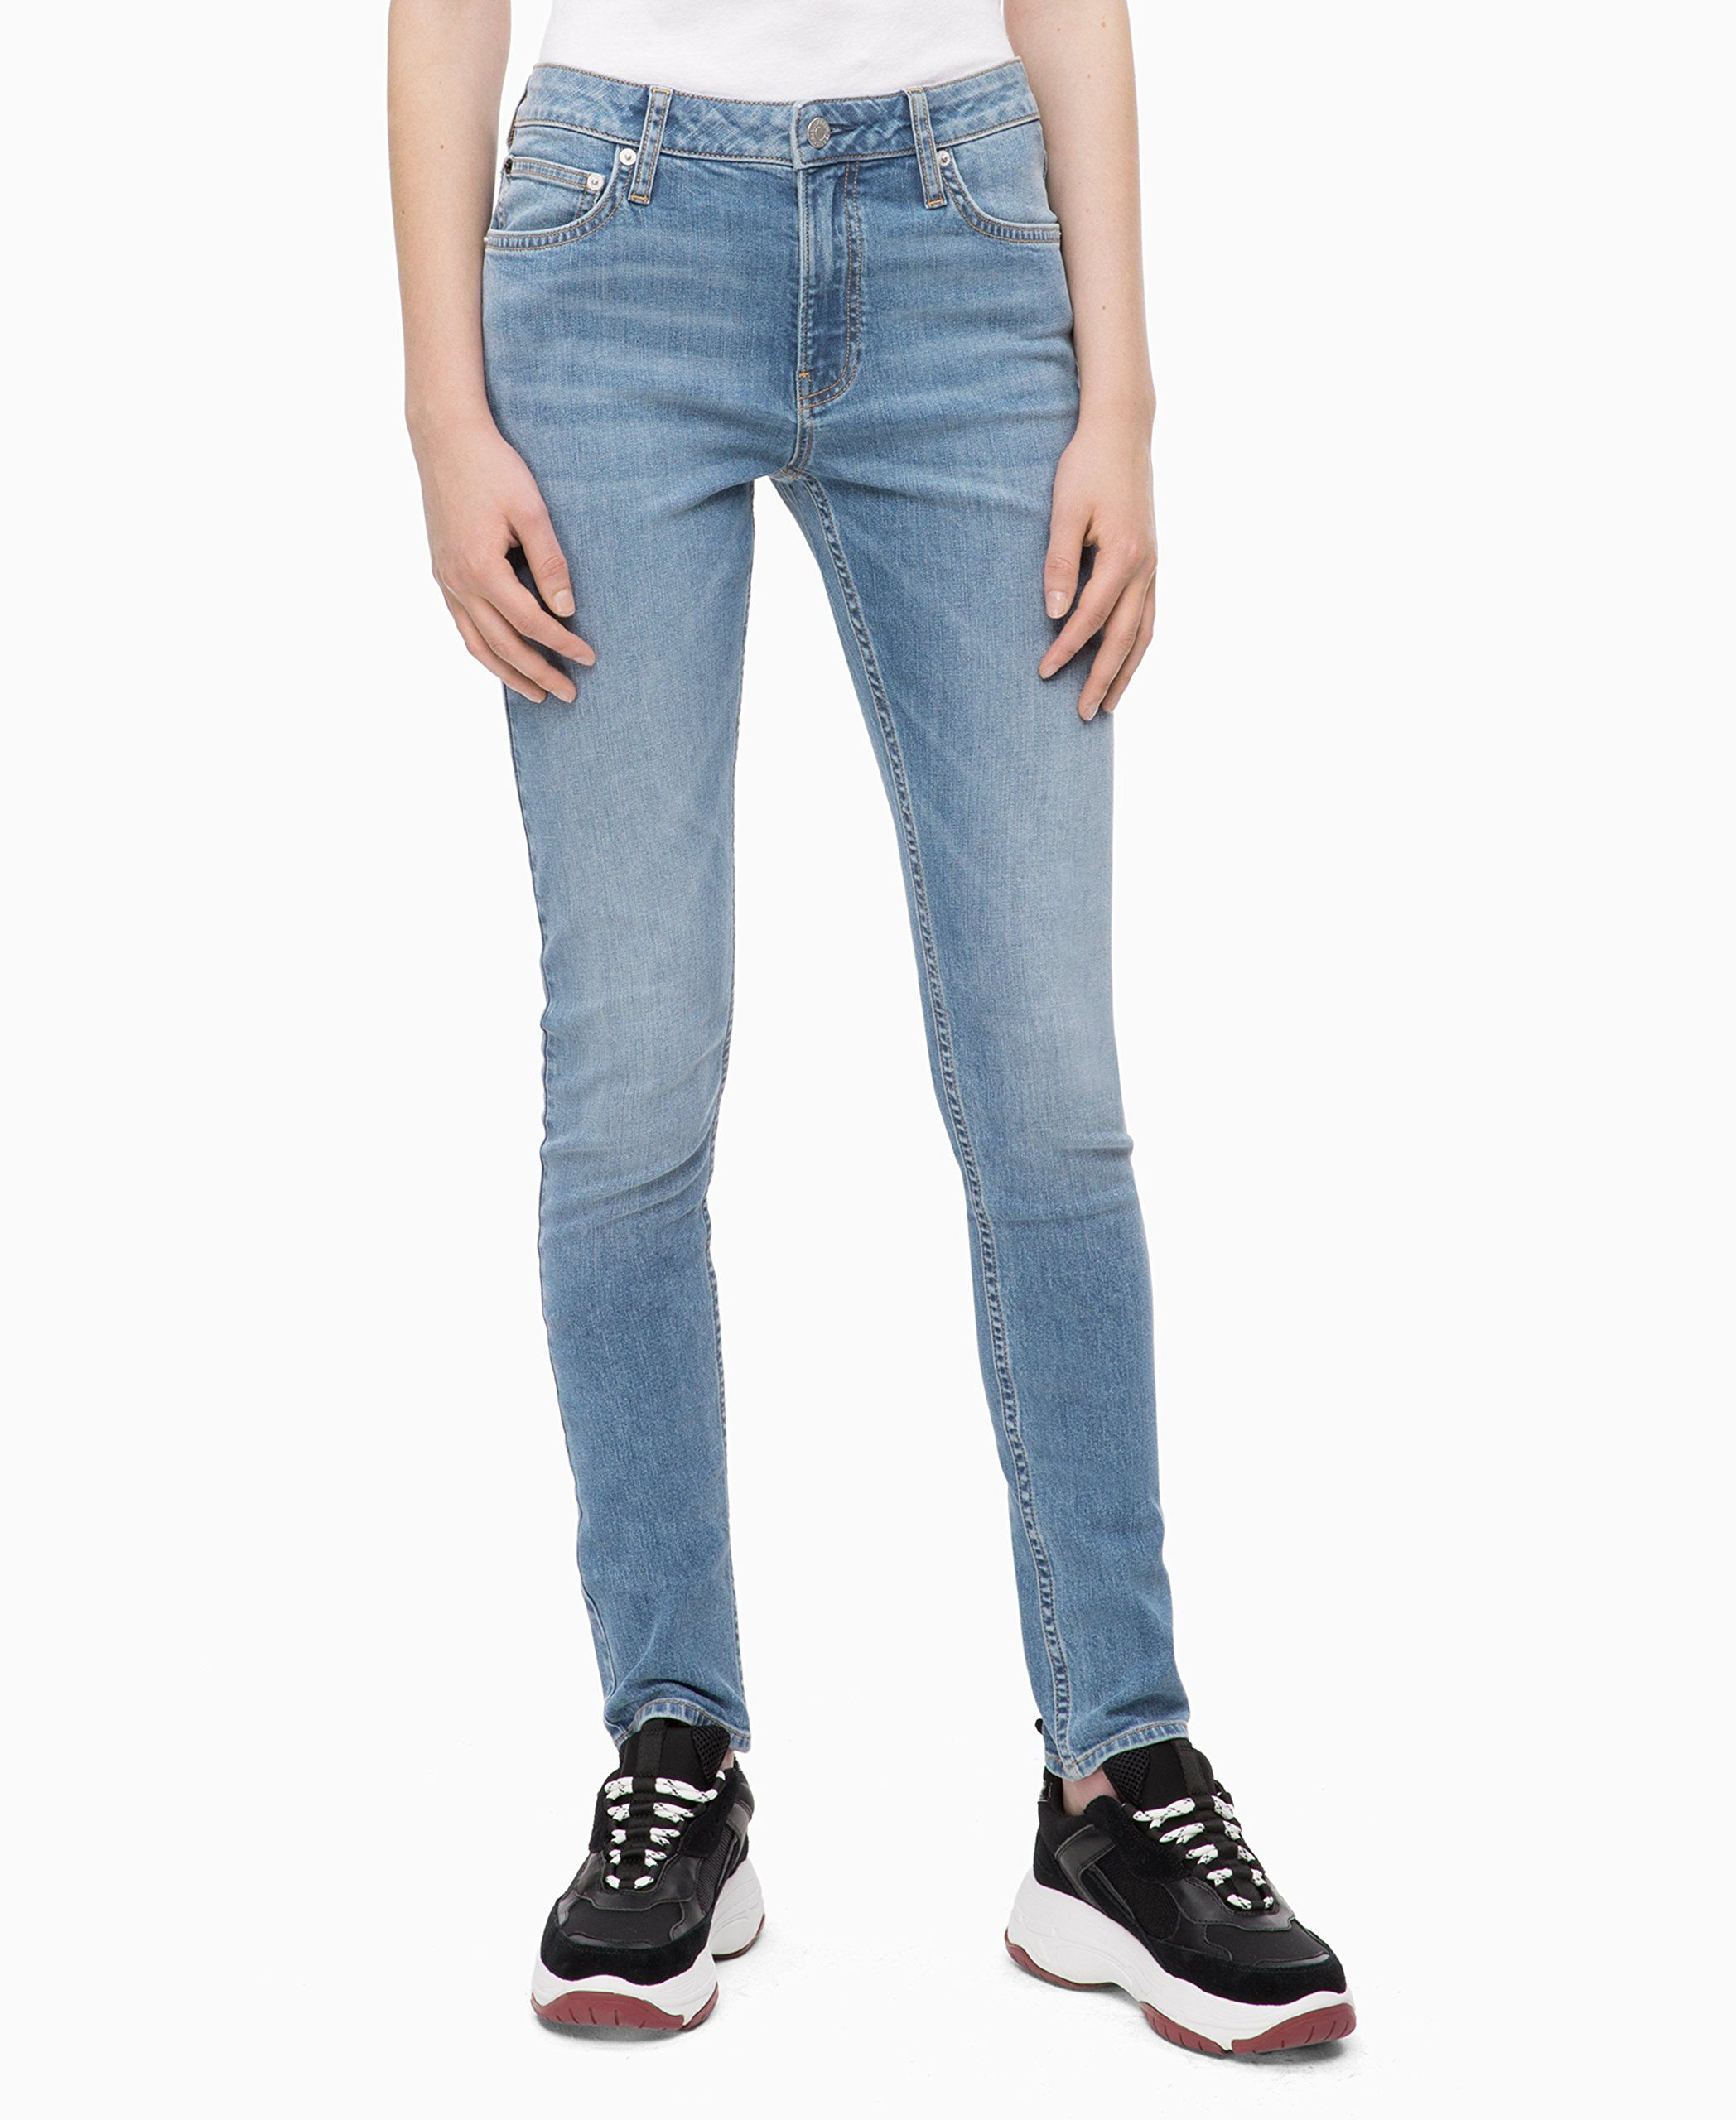 Calvin klein jeans womens ckj 021 mid rise slim fit jean